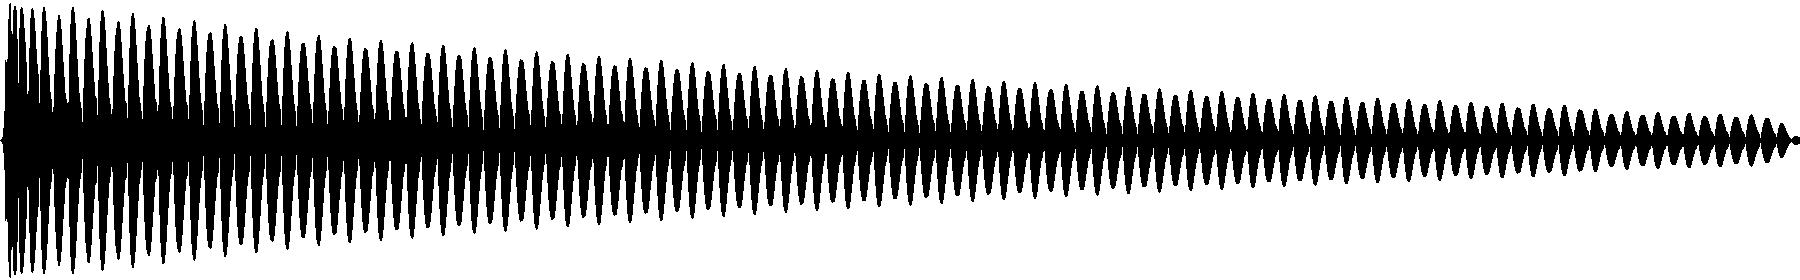 808  10